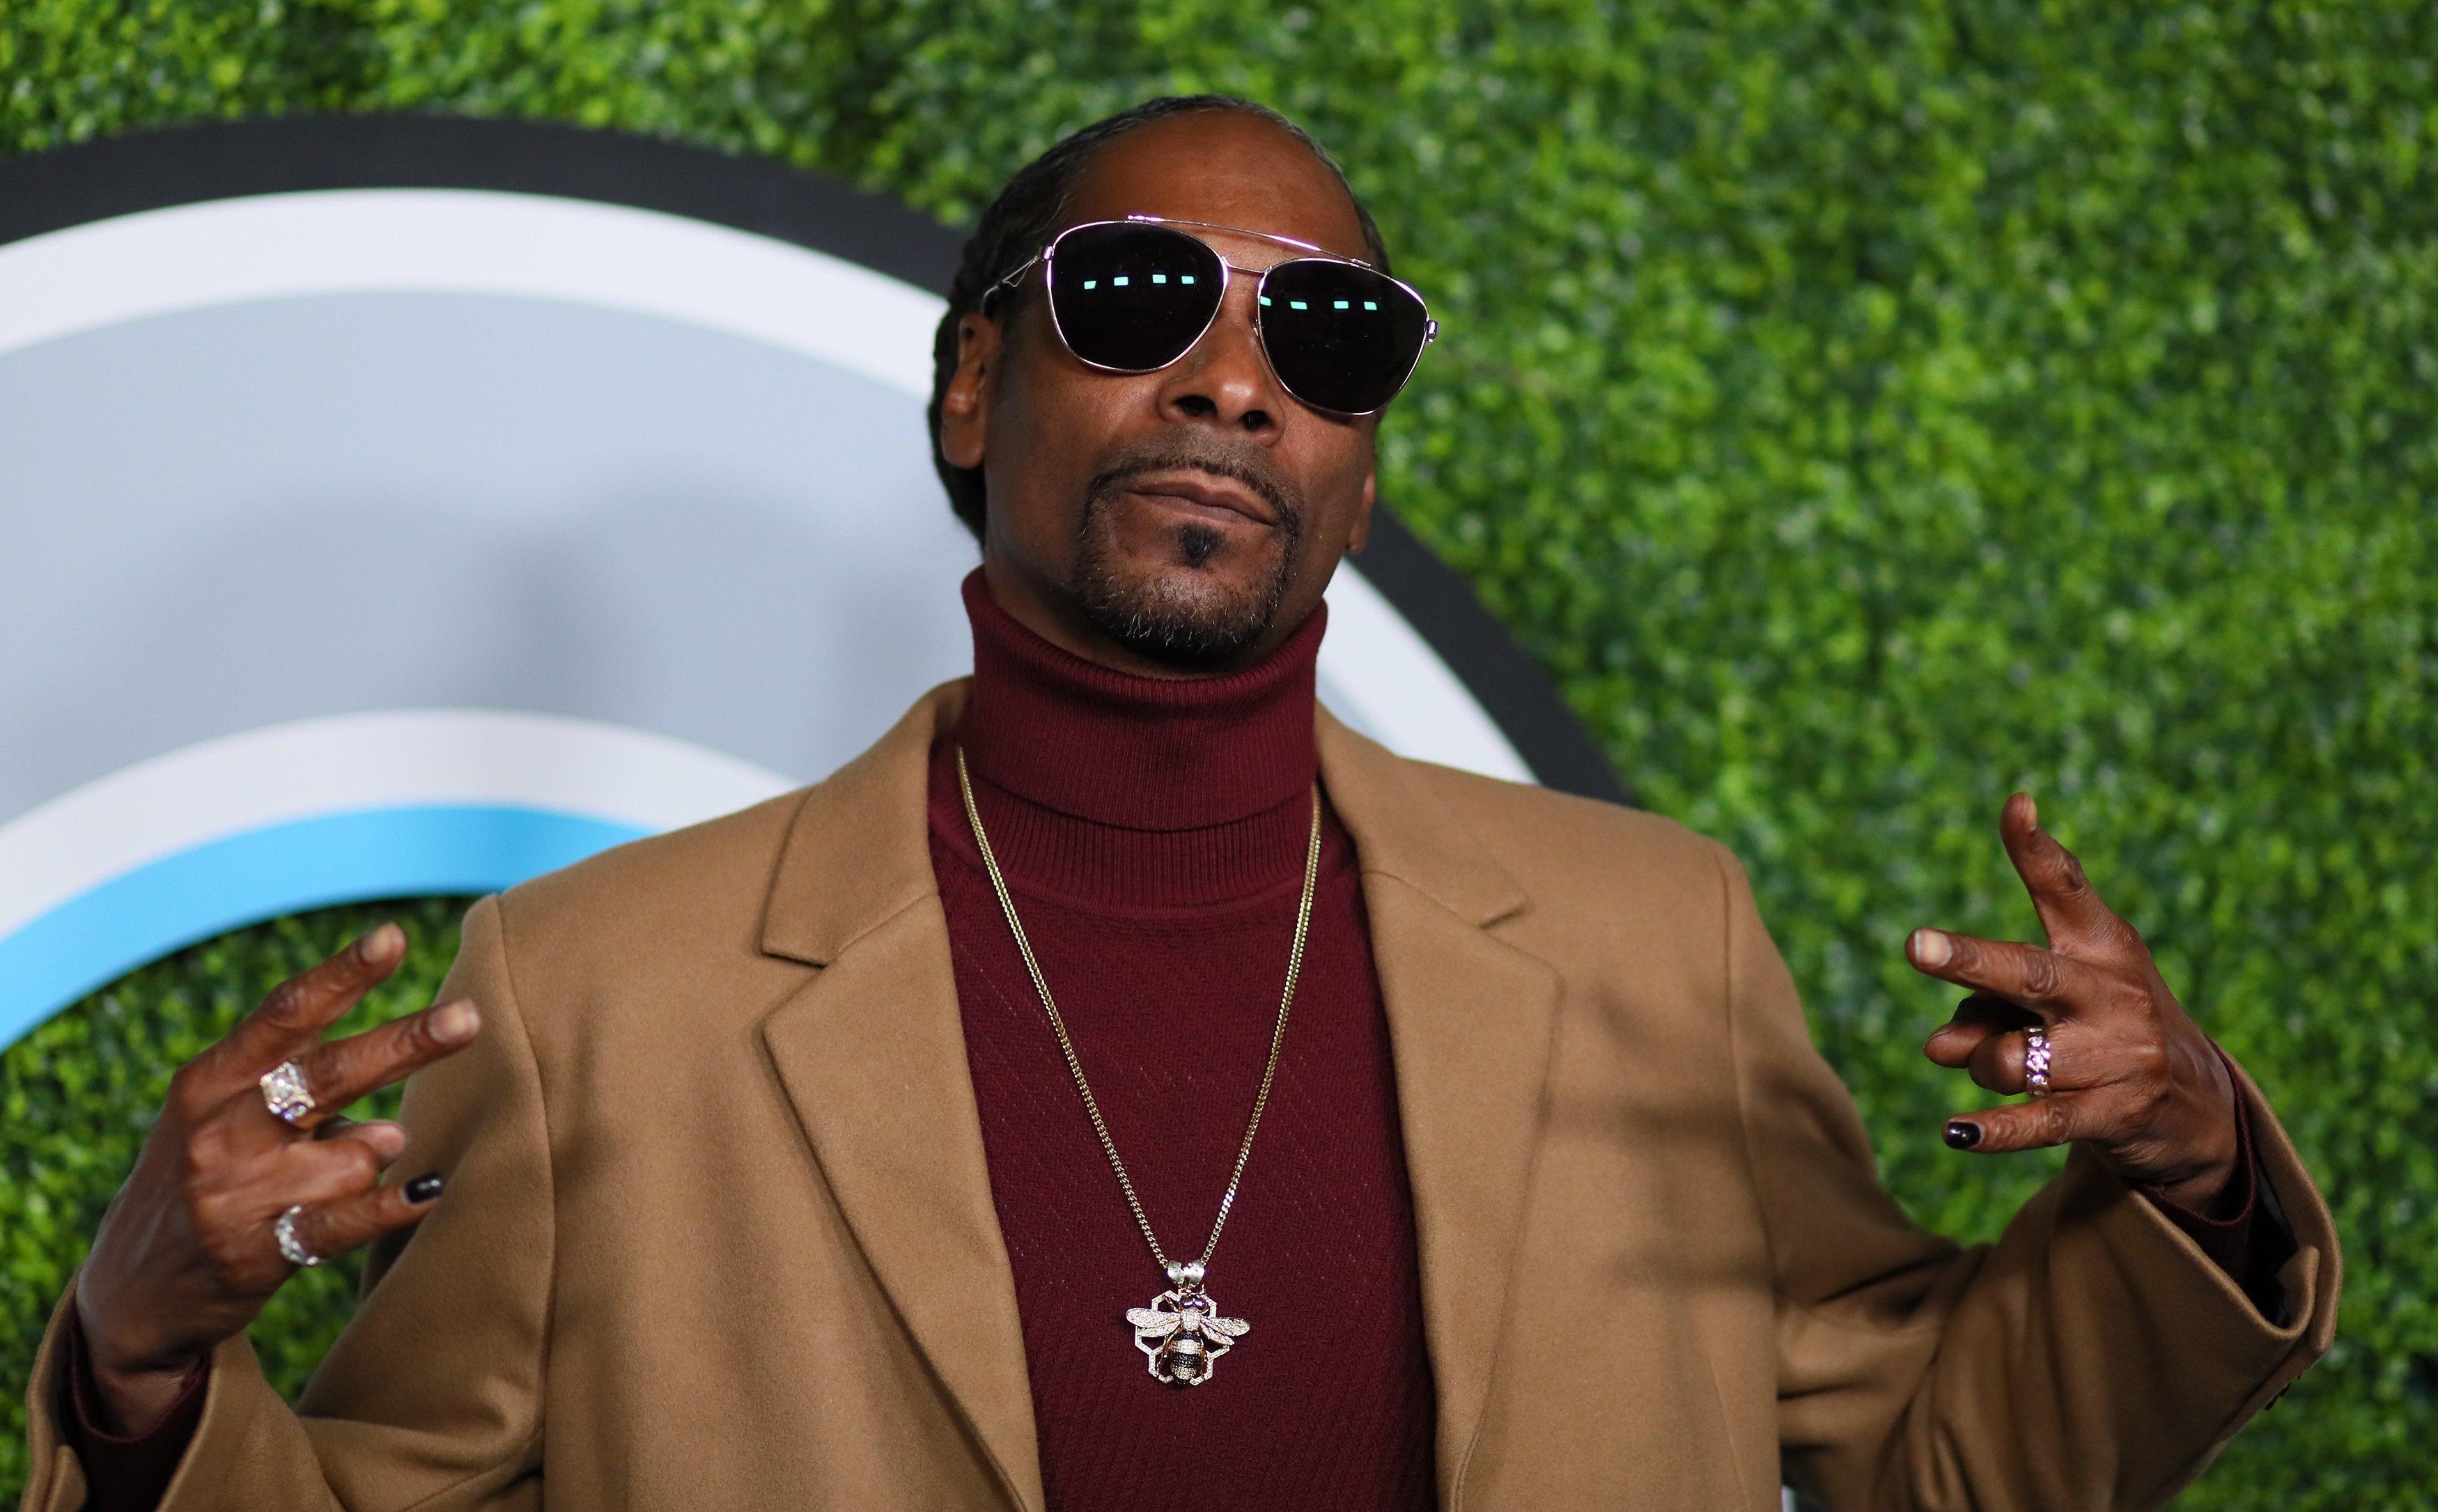 Snoop Dogg does turtlenecks right.